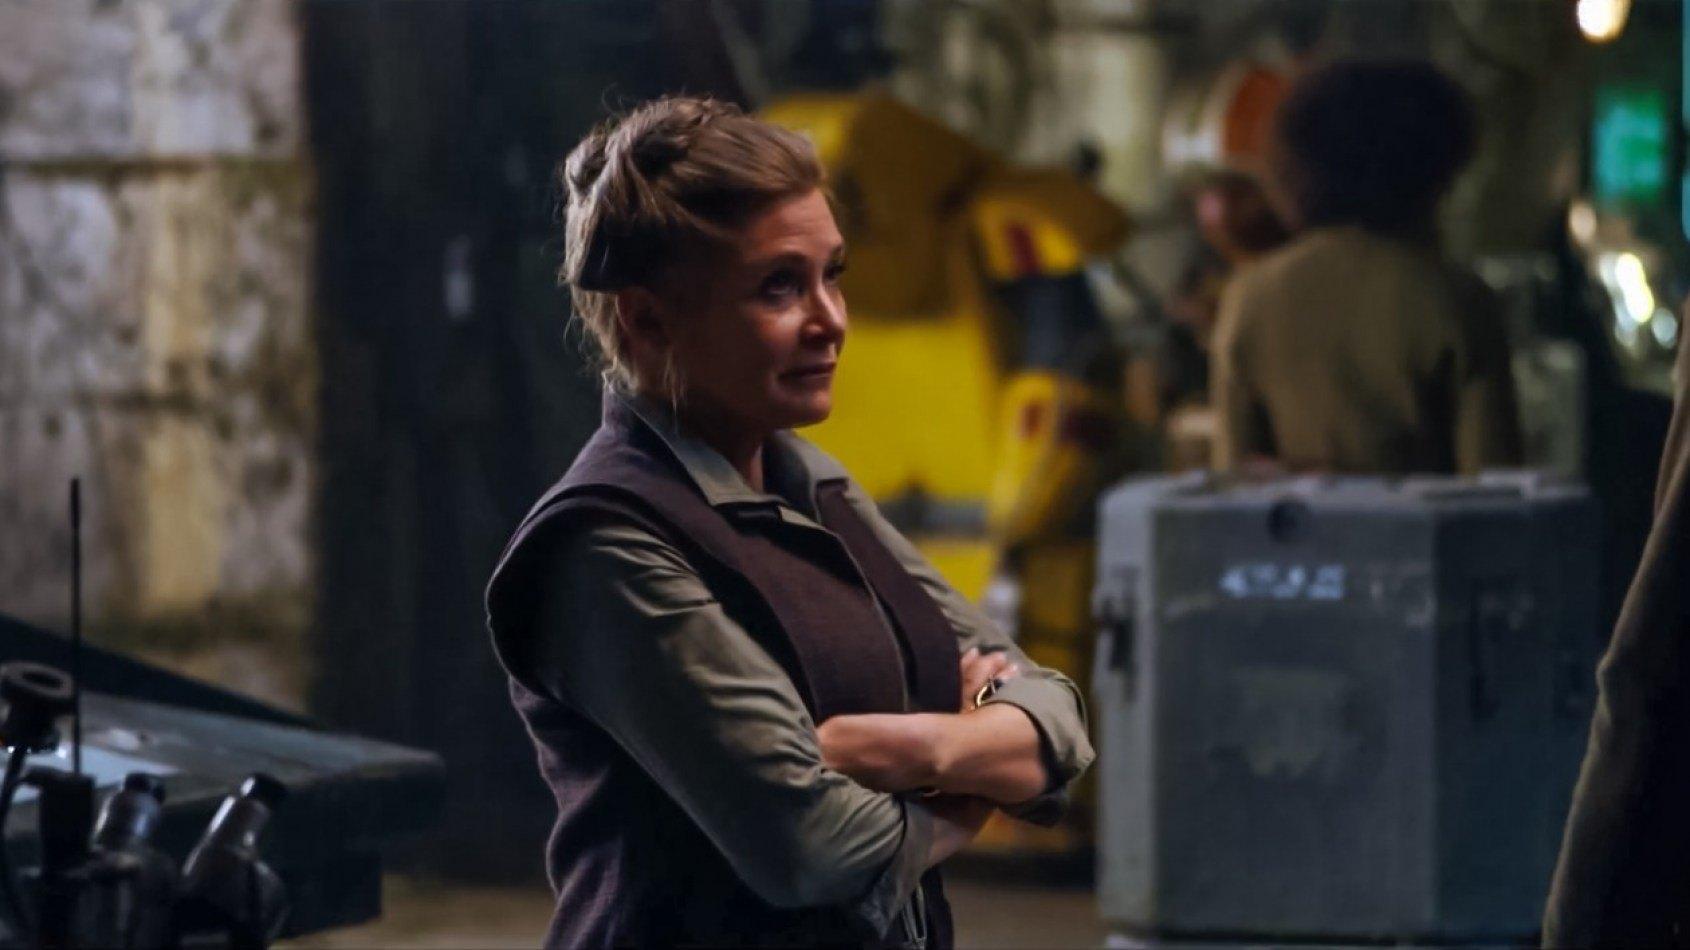 La 1�re sc�ne de Leia dans le R�veil de la Force